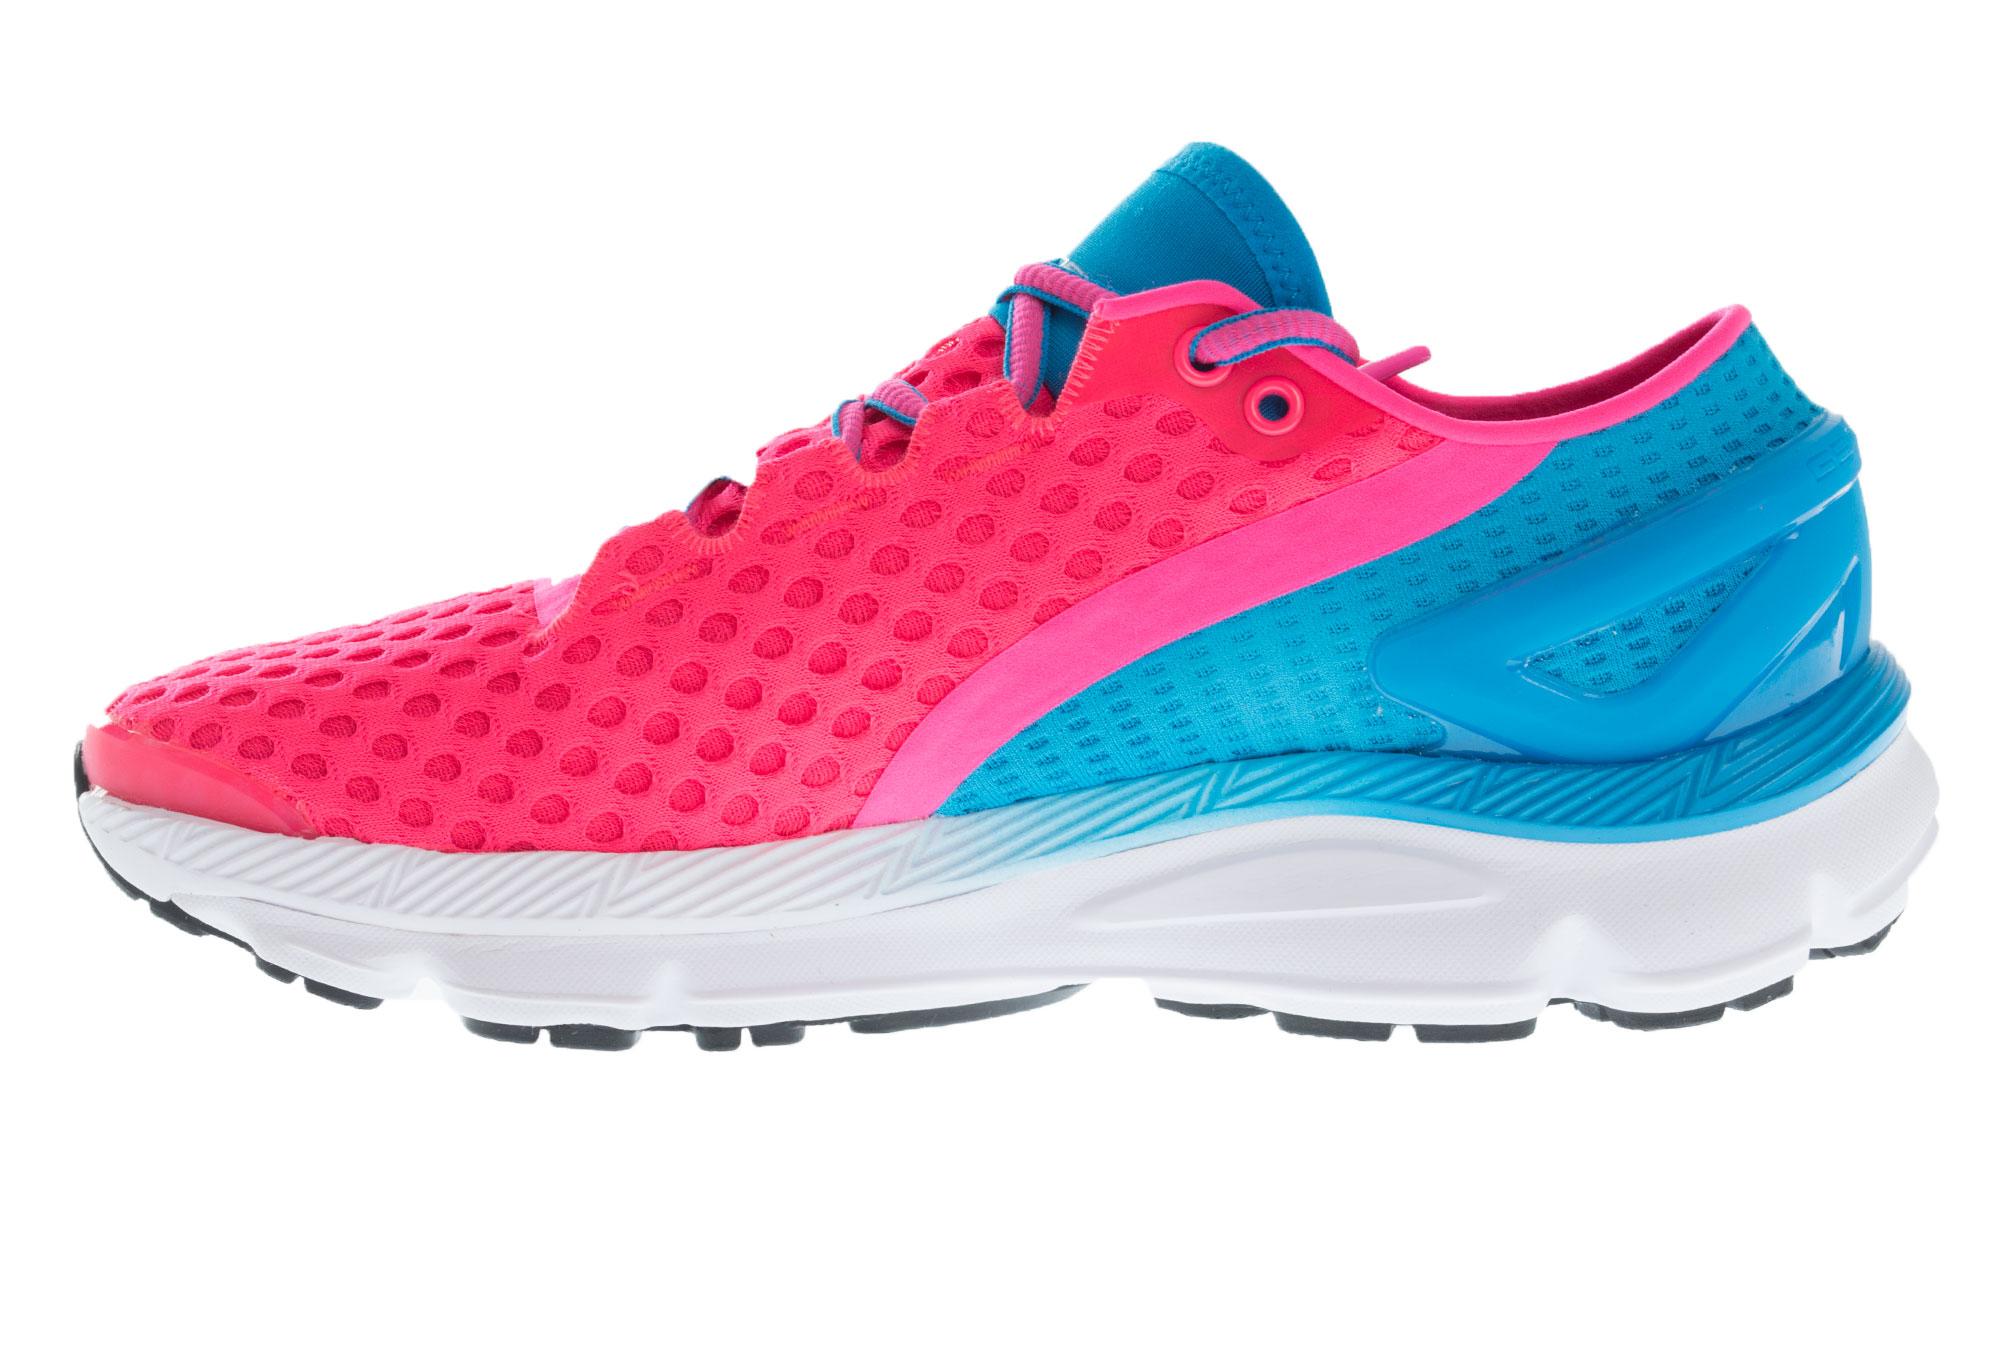 newest 4916e 2cc3c UNDER ARMOUR SPEEDFORM GEMINI 2 Pair of Shoes Pink Blue Women